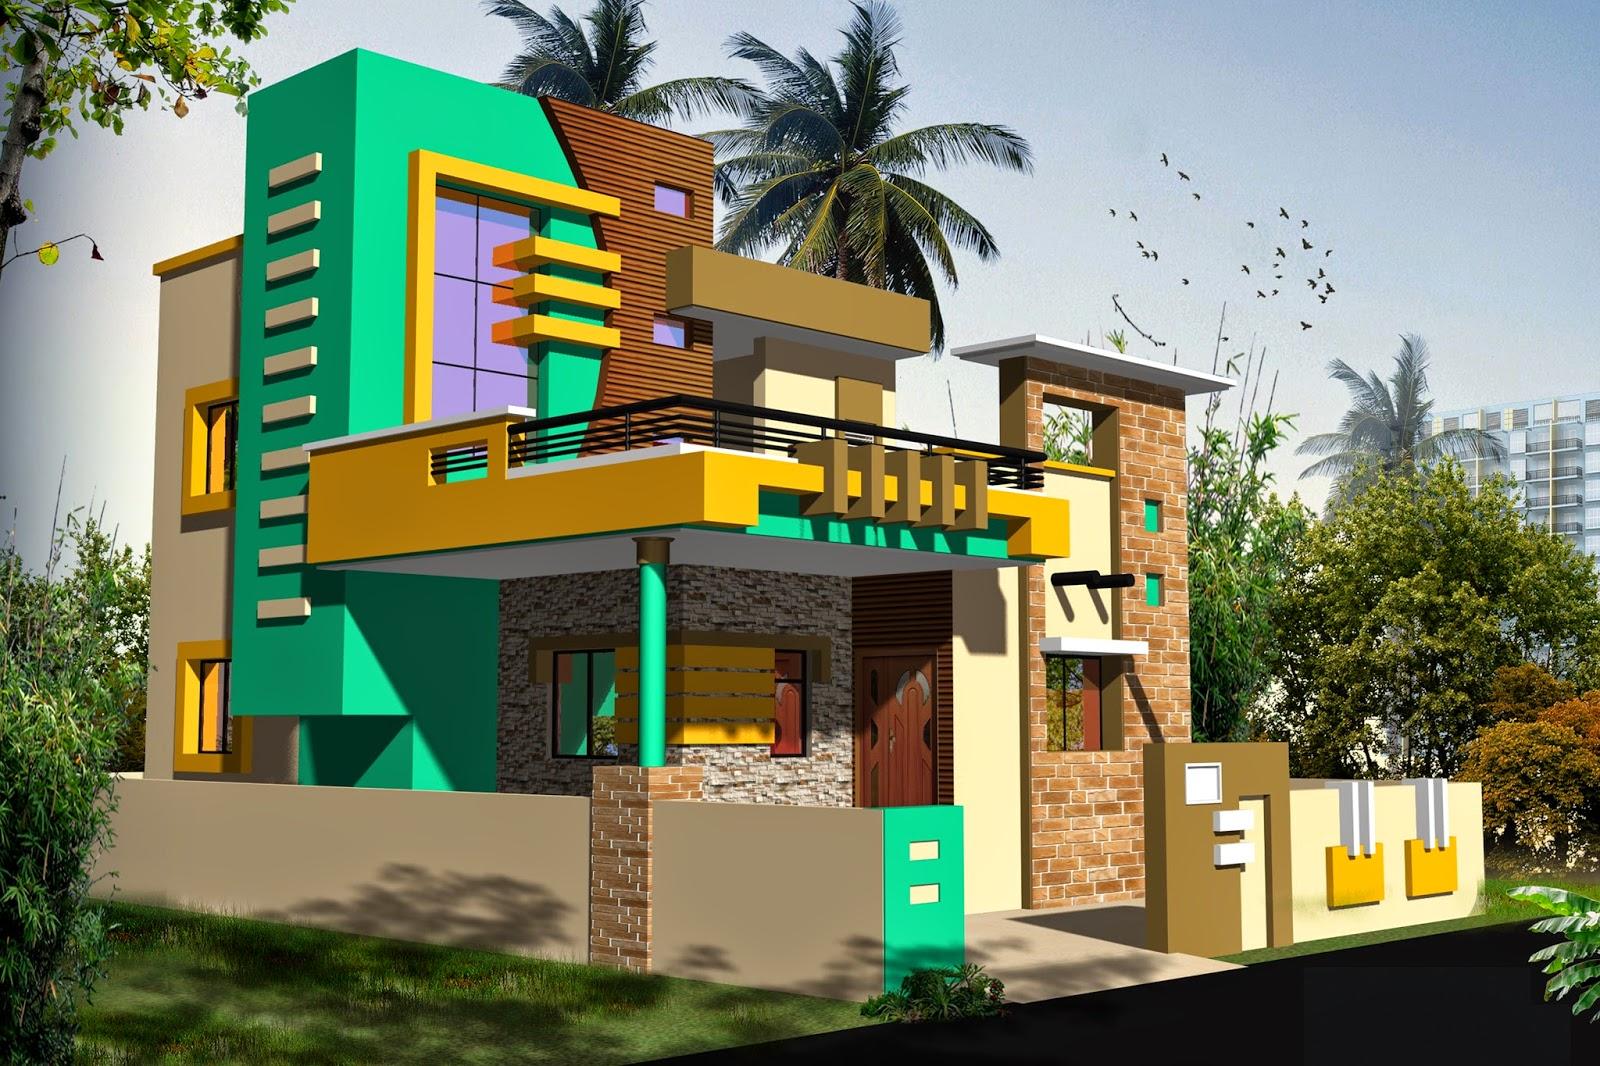 3d home design ground floor. D K 3D HOME DESIGN ground floor house